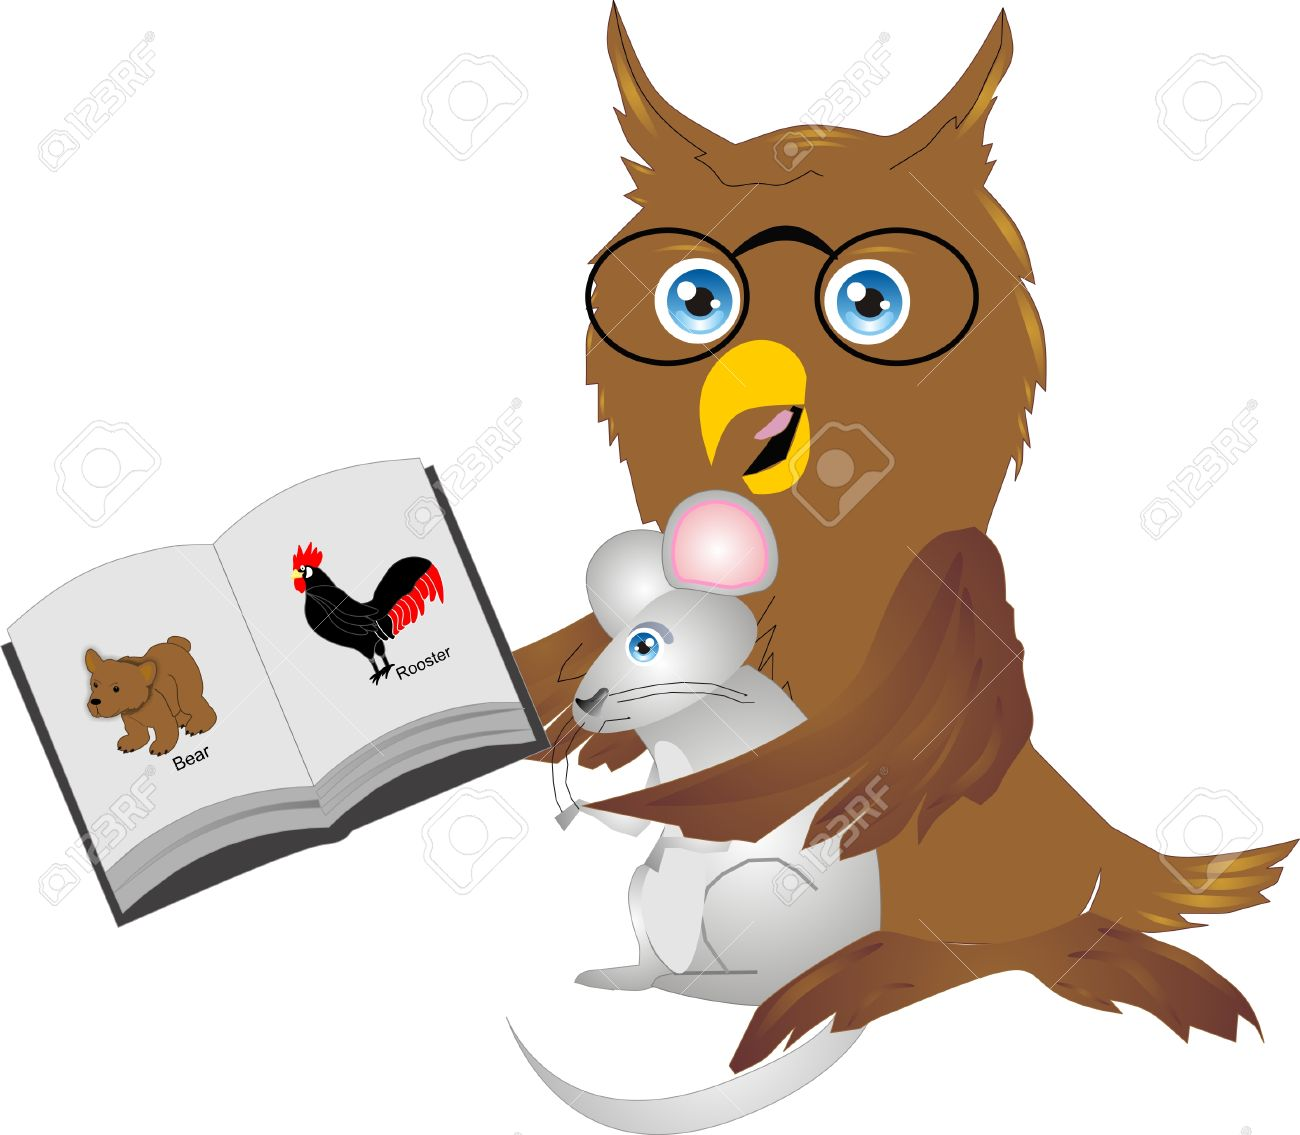 Owl, Bird, Predator, Carnivore, Feathers, Night, Horned, Glasses ...